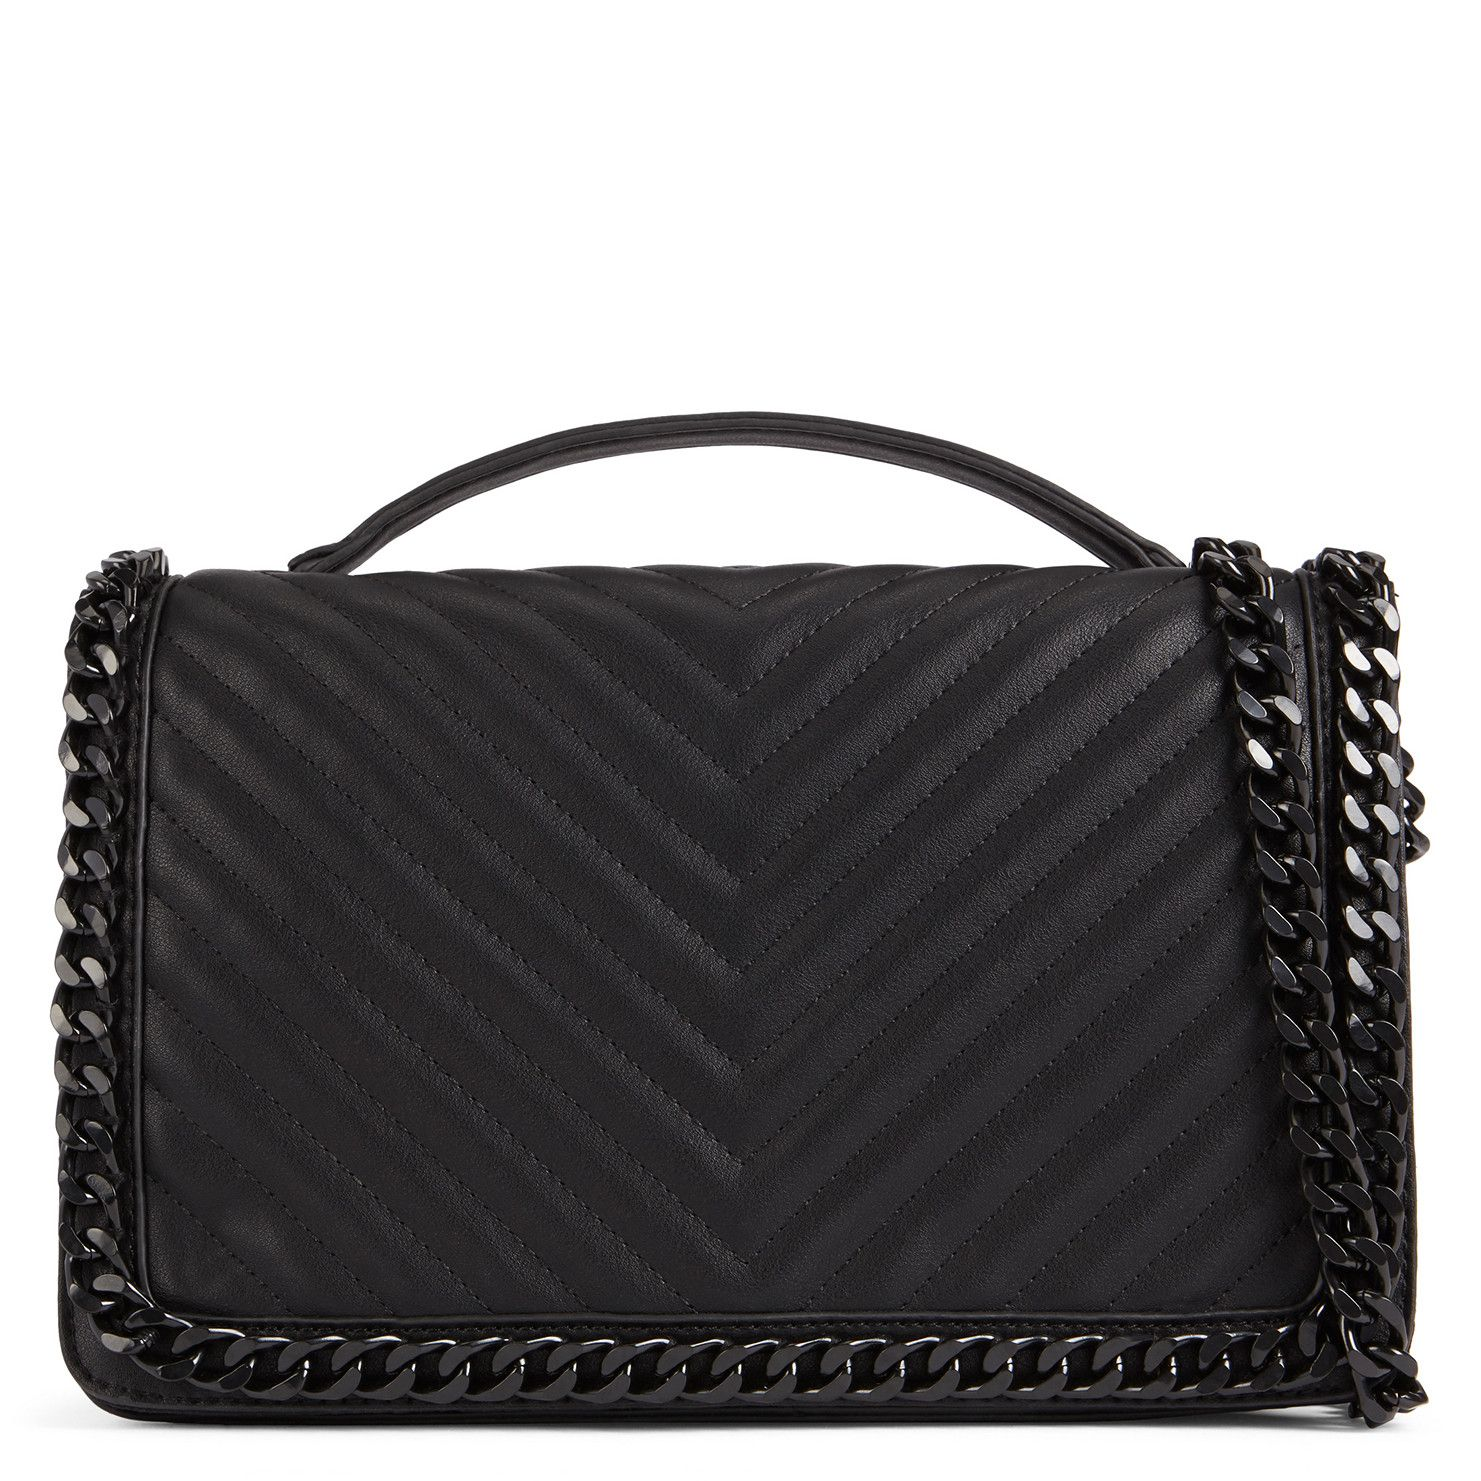 46255797 Bags | ALDOShoes.com | Purse Handbags | Pinterest | Bag ...